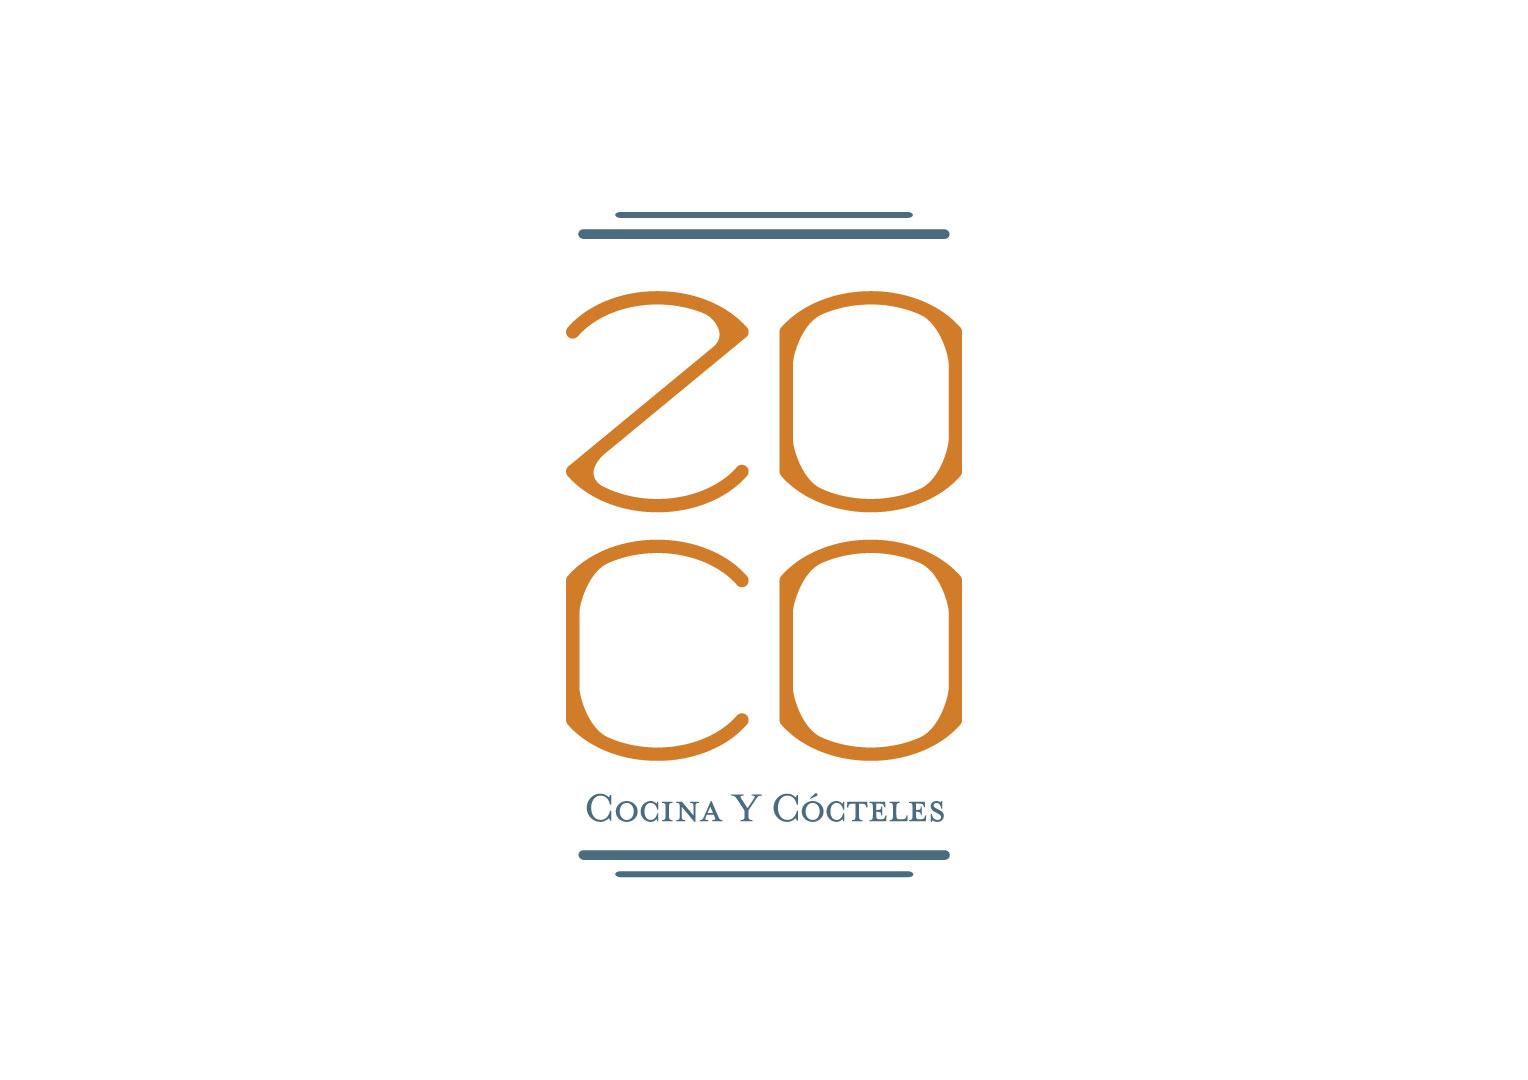 zoco_logo